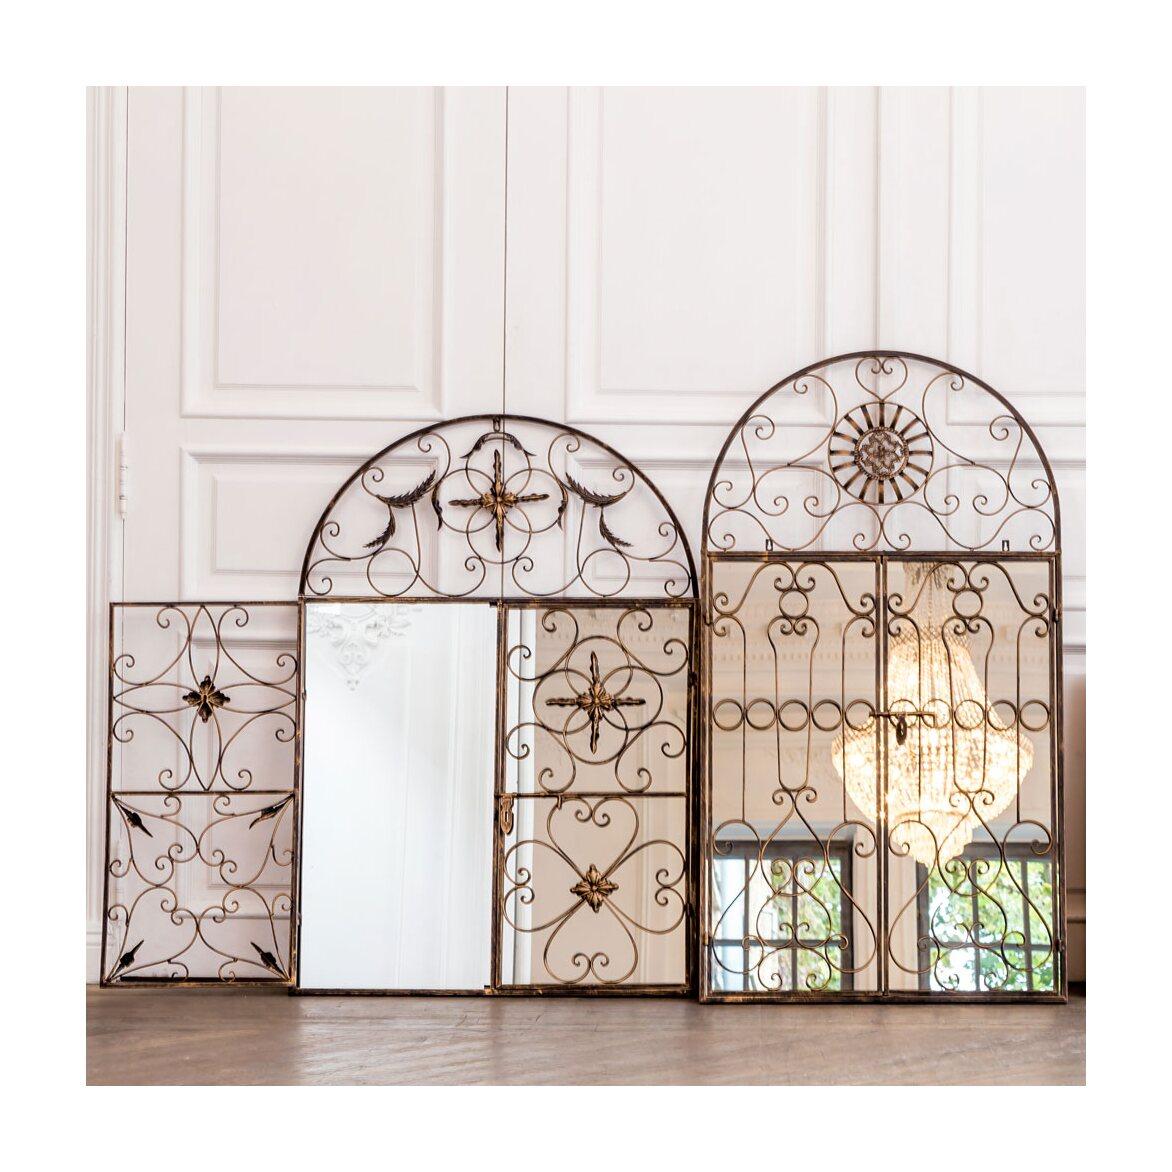 Настенное зеркало «Бизе» (королевская бронза) 4   Настенные зеркала Kingsby